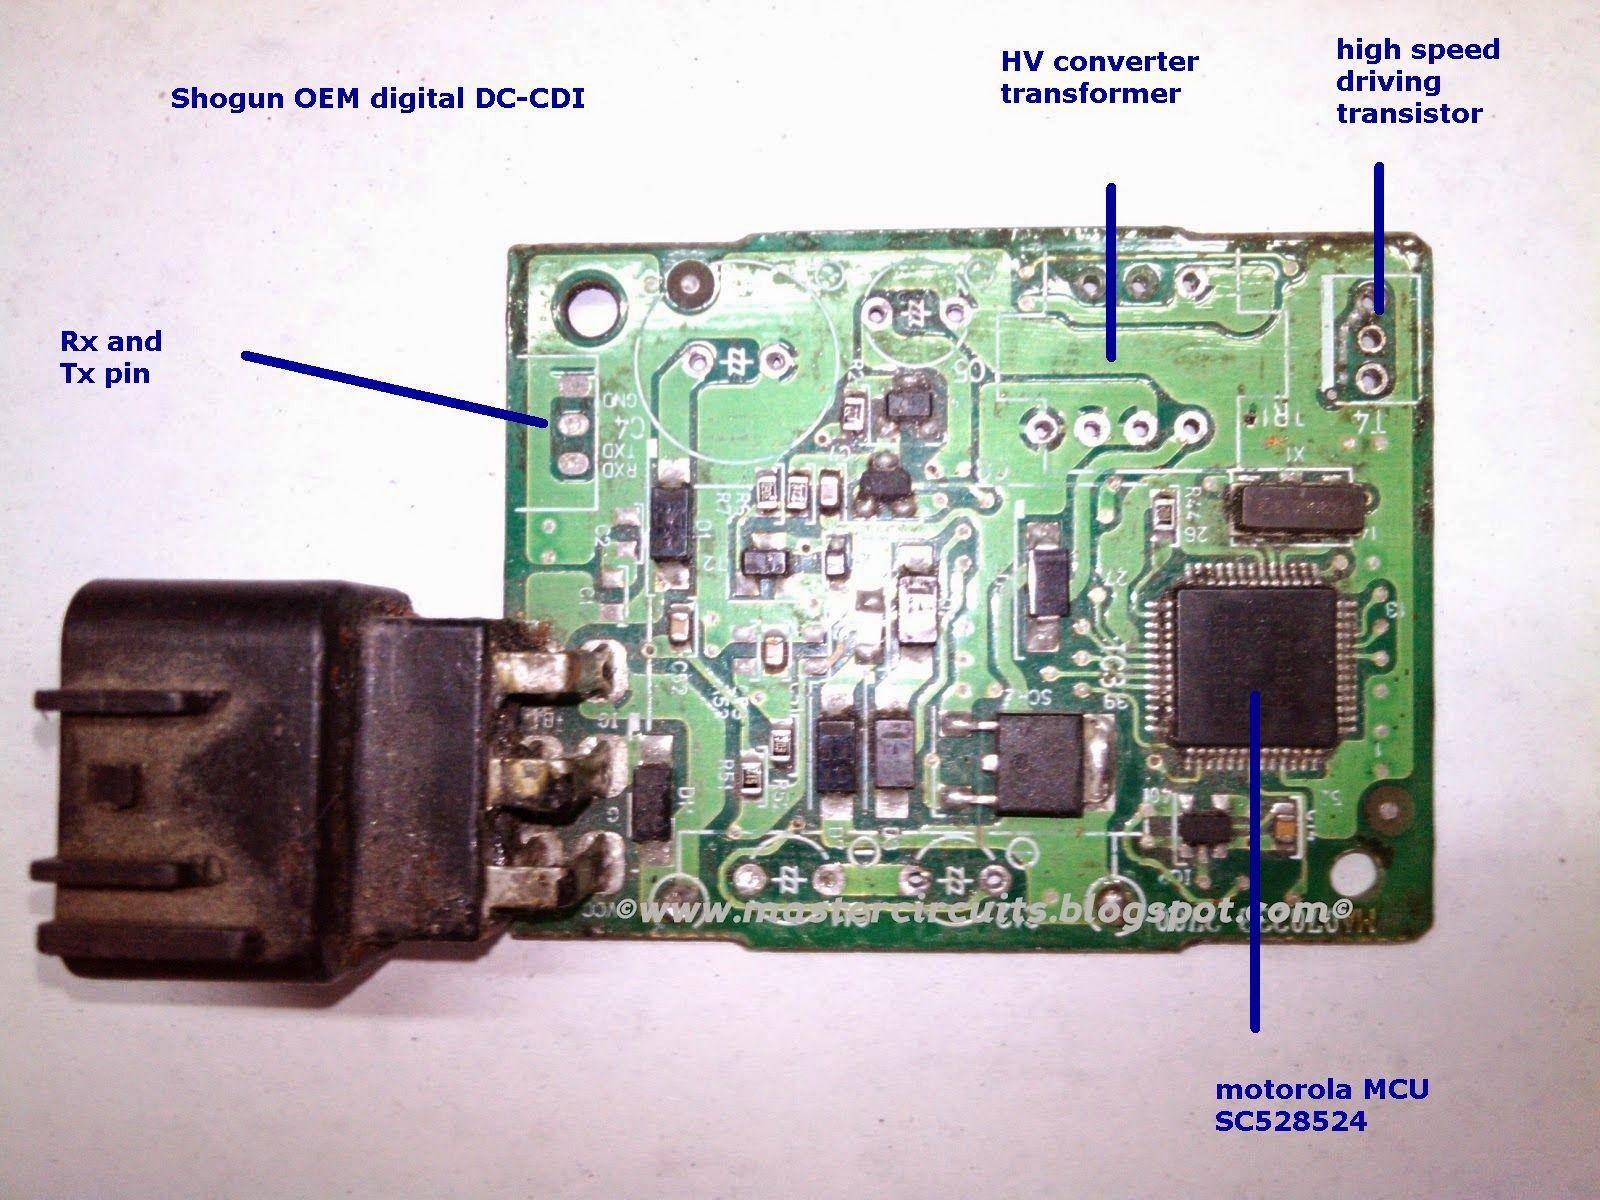 medium resolution of modified cdi dc cdi schematic cdi upgrade shogun cdi shogun racing cdi pi16f628a cdi